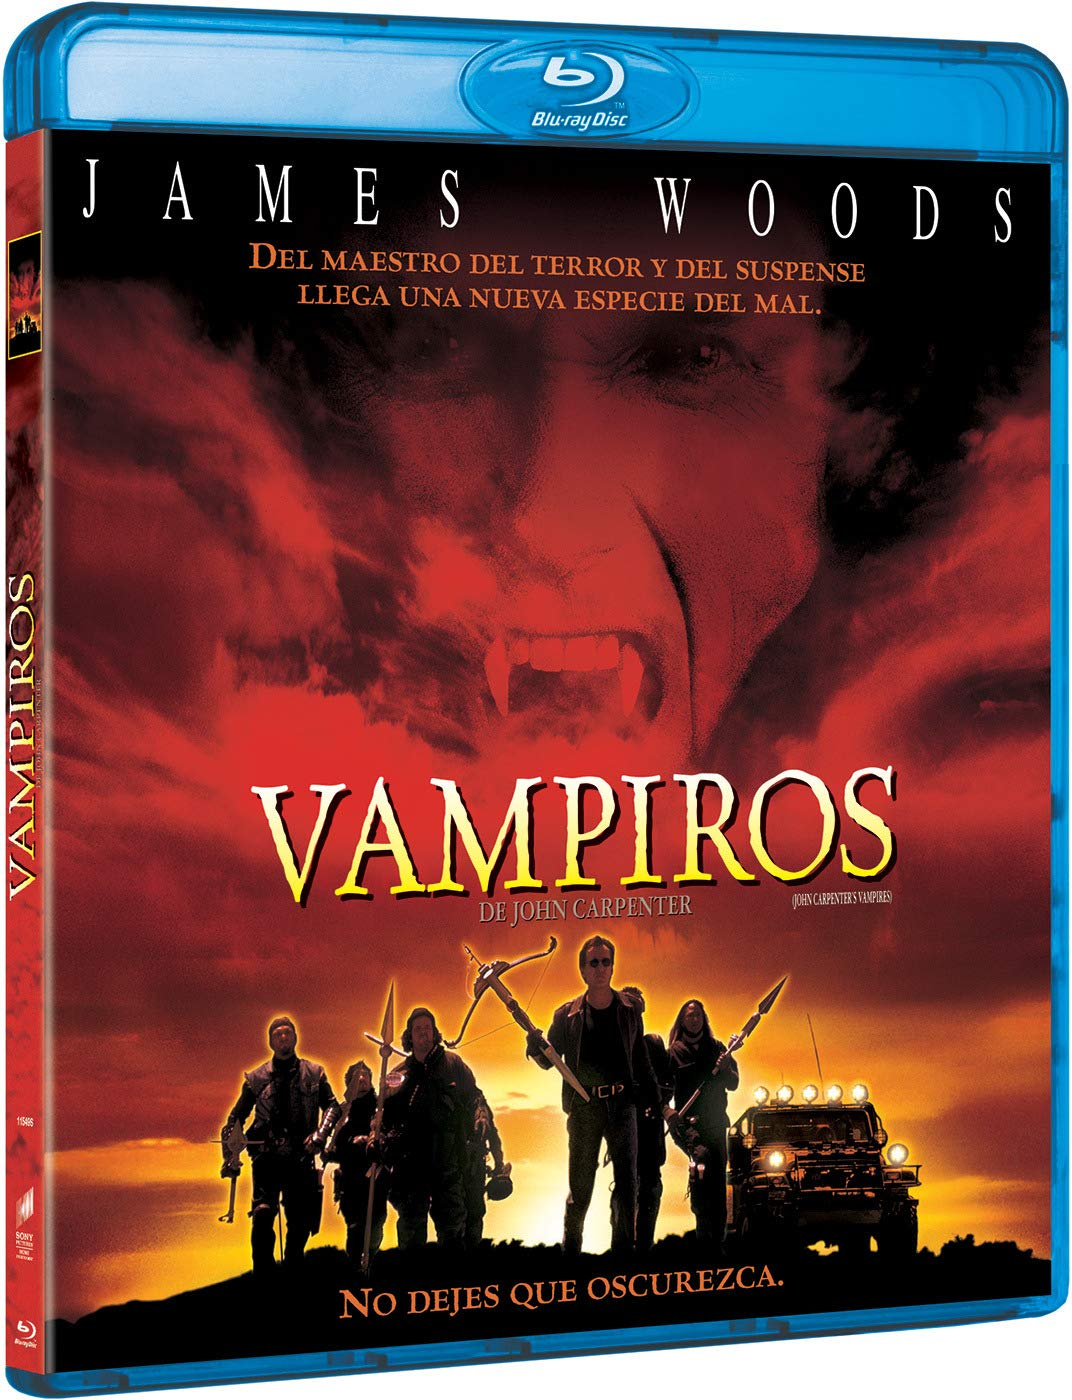 Vampiros De John Carpenter [Blu-ray]: Amazon.es: James Woods, Daniel Baldwin, John Carpenter, James Woods, Daniel Baldwin, JVC Entertainment Networks: Cine y Series TV